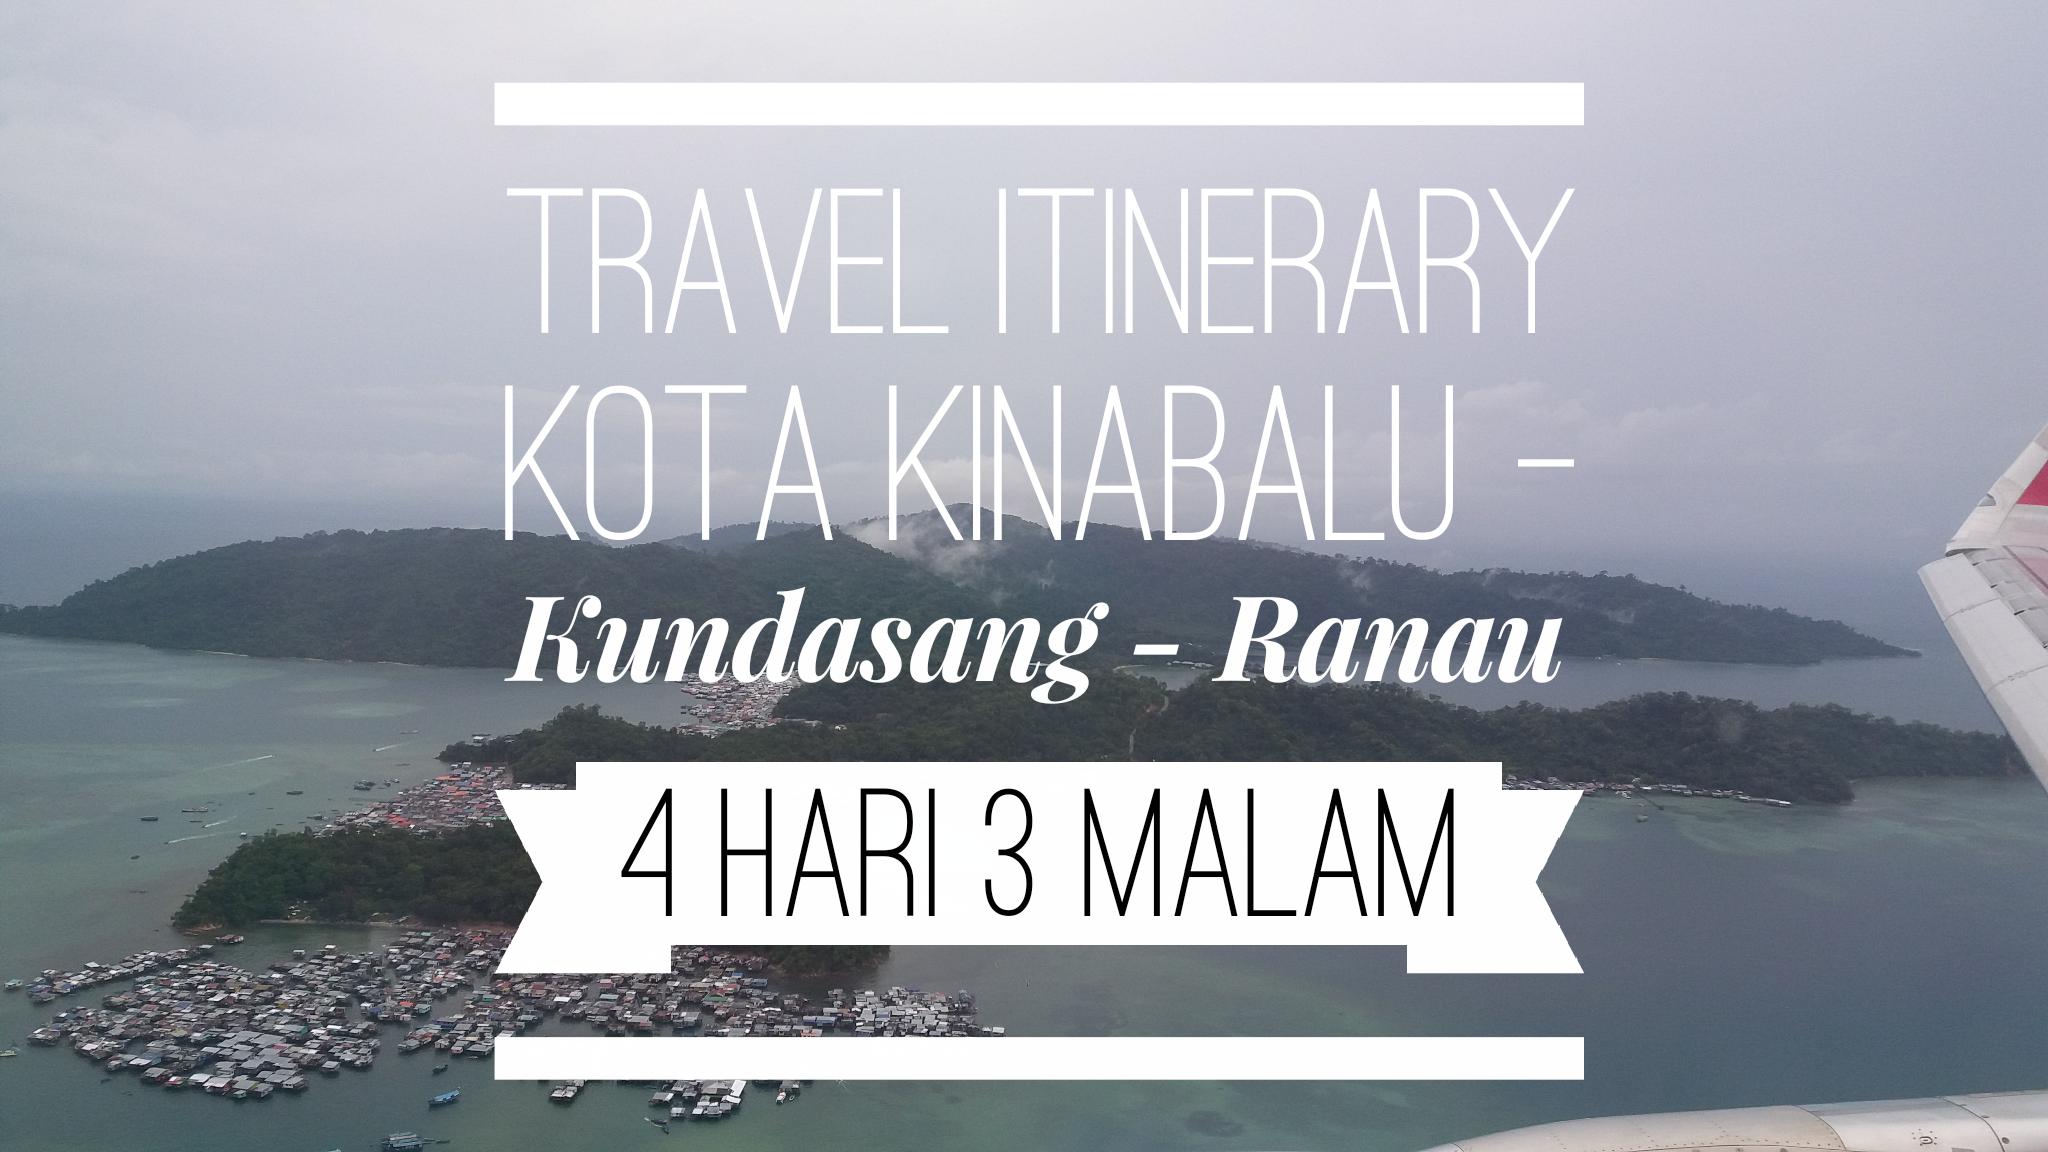 Travelog Sabah – Travel Itinerary Kota Kinabalu – Kundasang – Ranau (4 Hari 3 Malam)